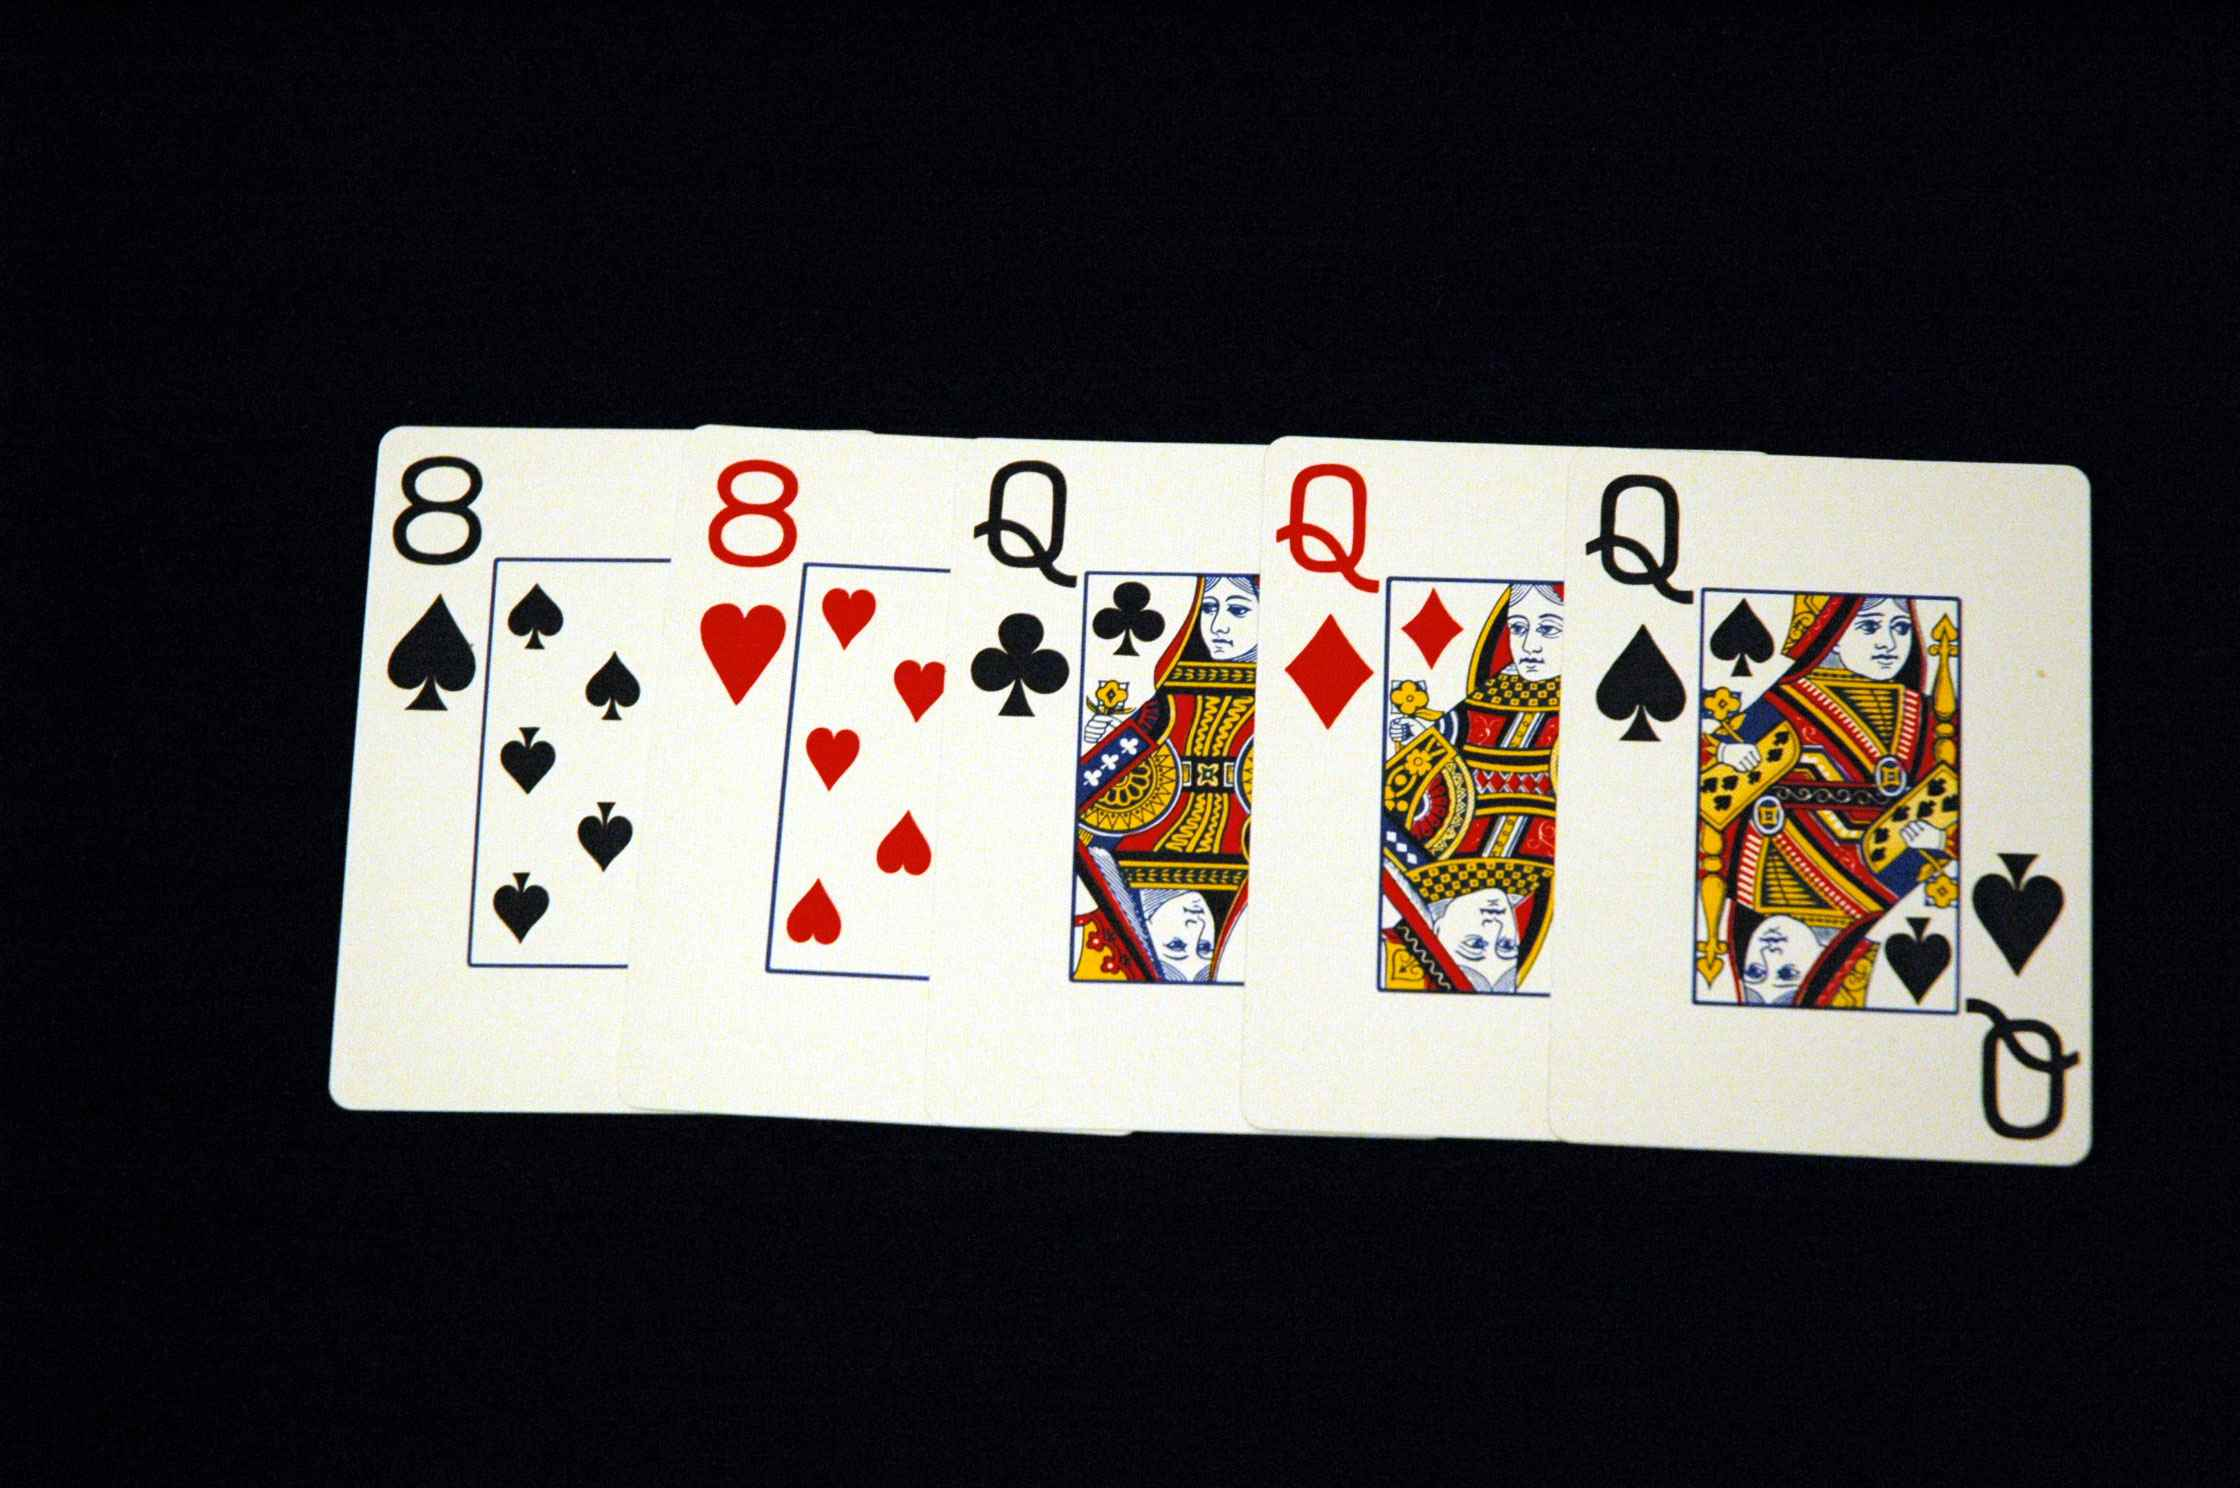 Official poker rankings